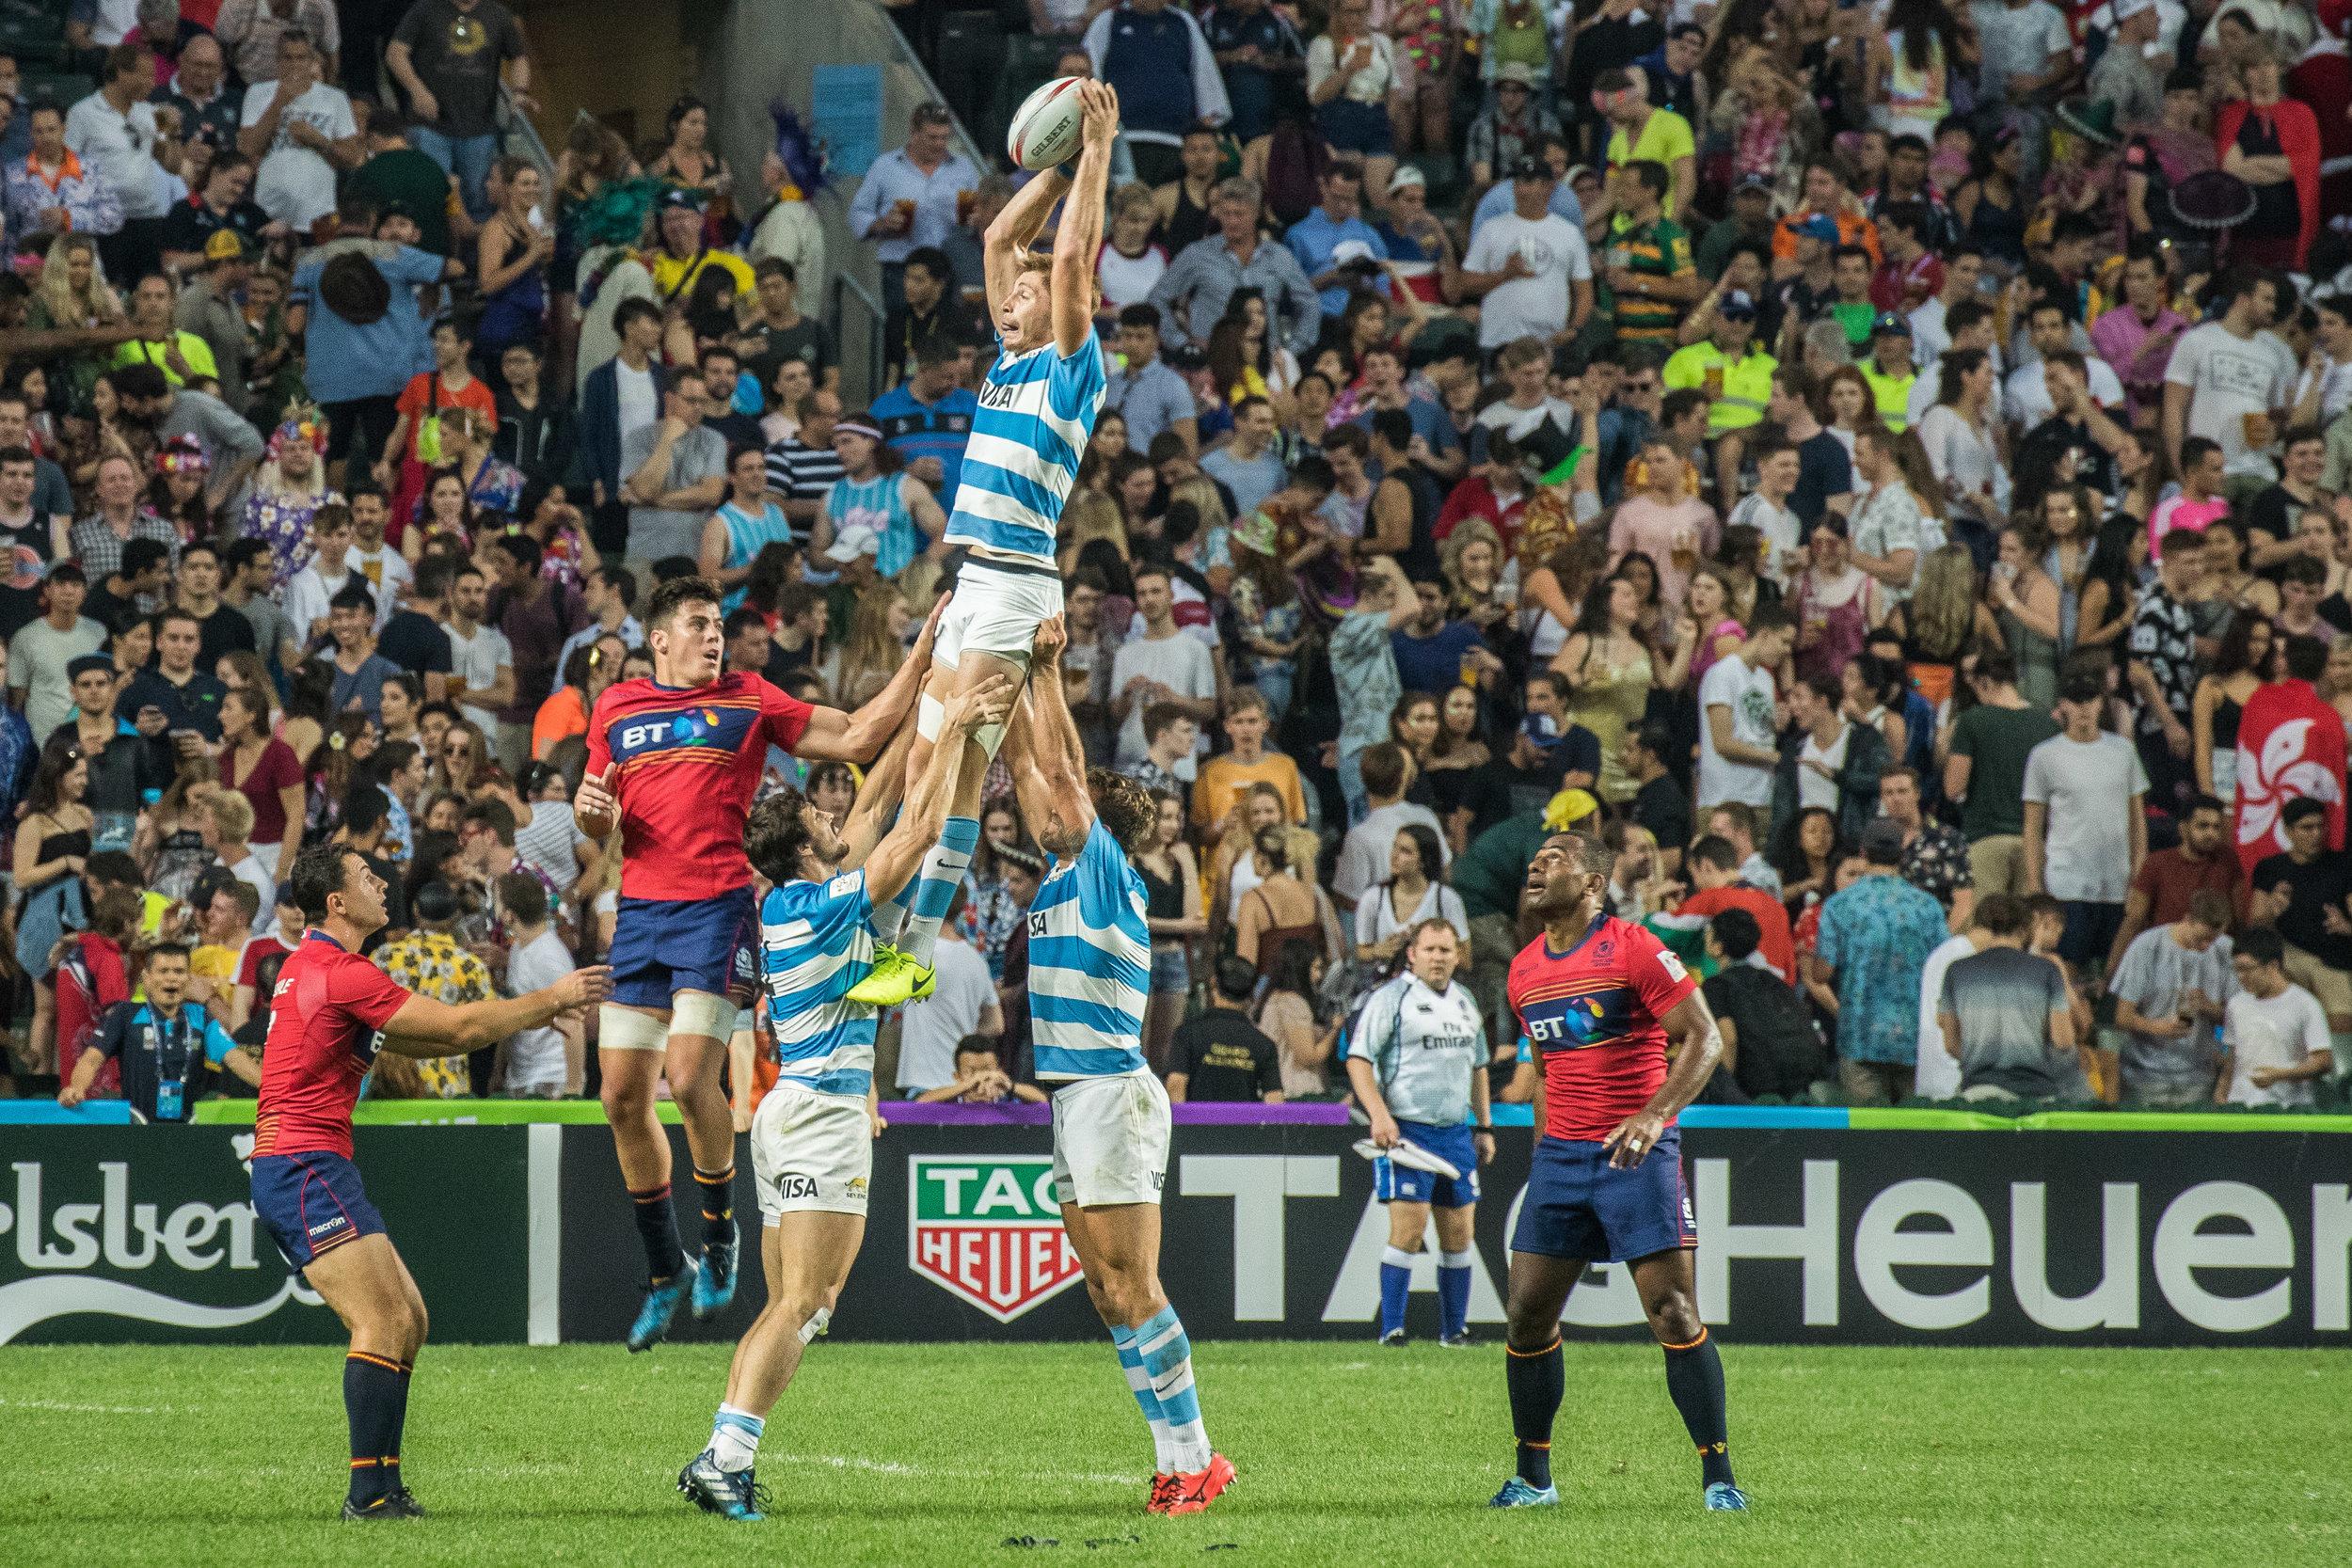 TAG Heuer_Rugby7s-2017_Michael CW Chiu-5.jpg